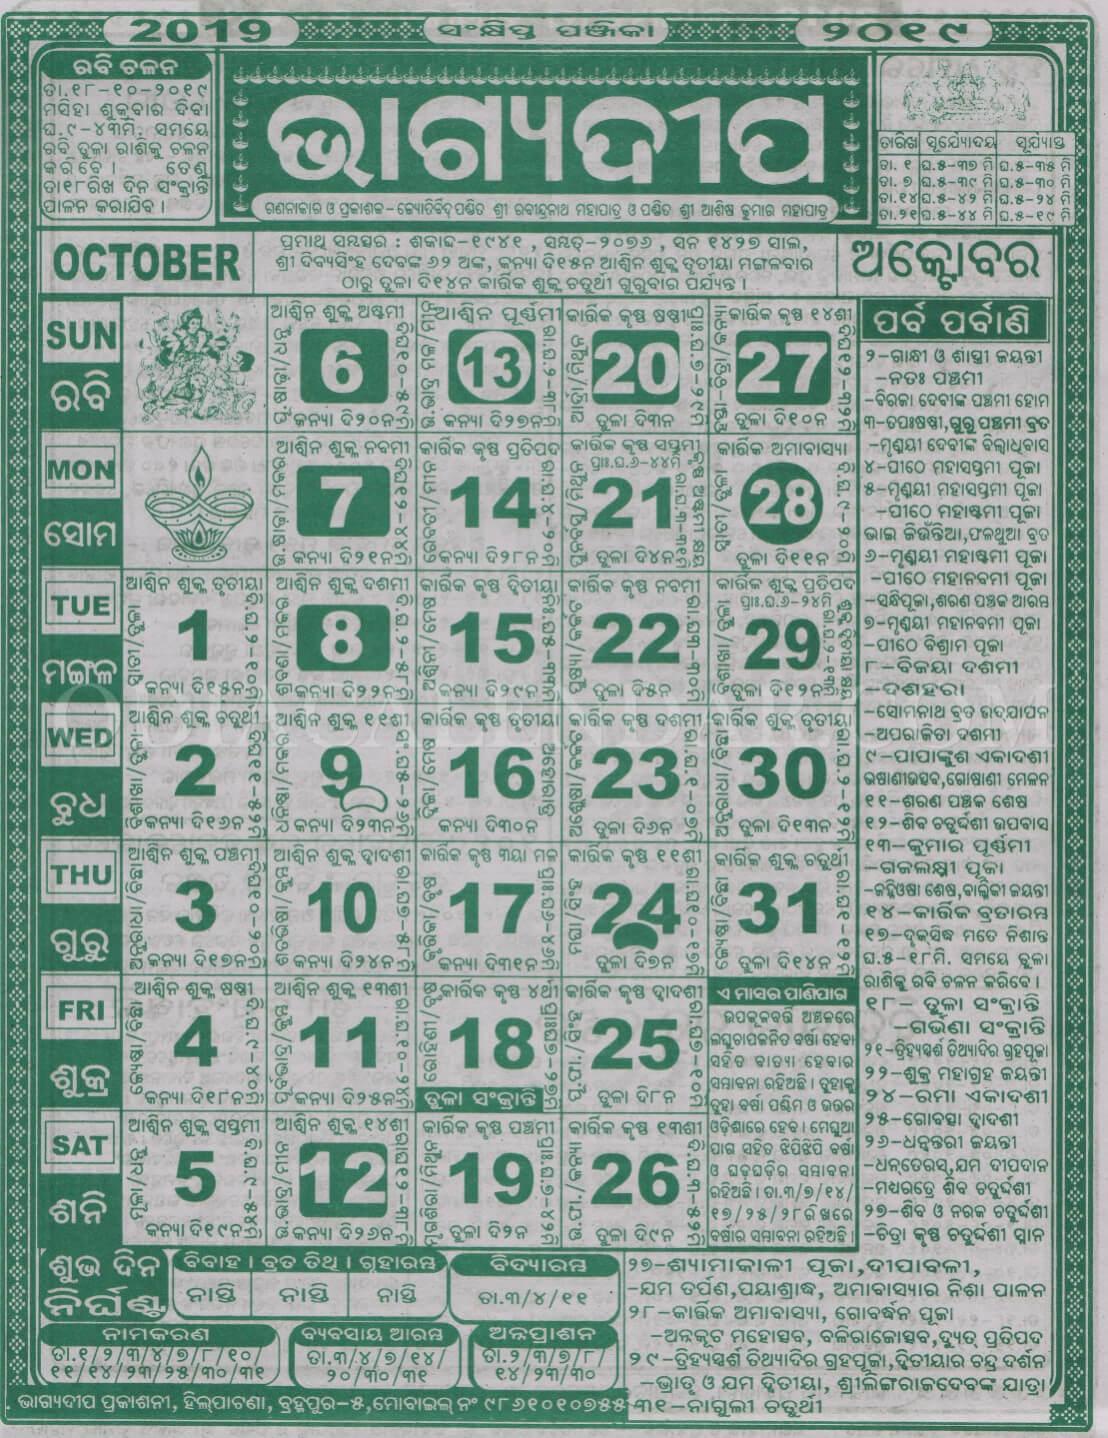 Odia Bhagyadeep Calendar 2020 October View And Download Free with regard to Bhagyadipa Odia Calendar 2020